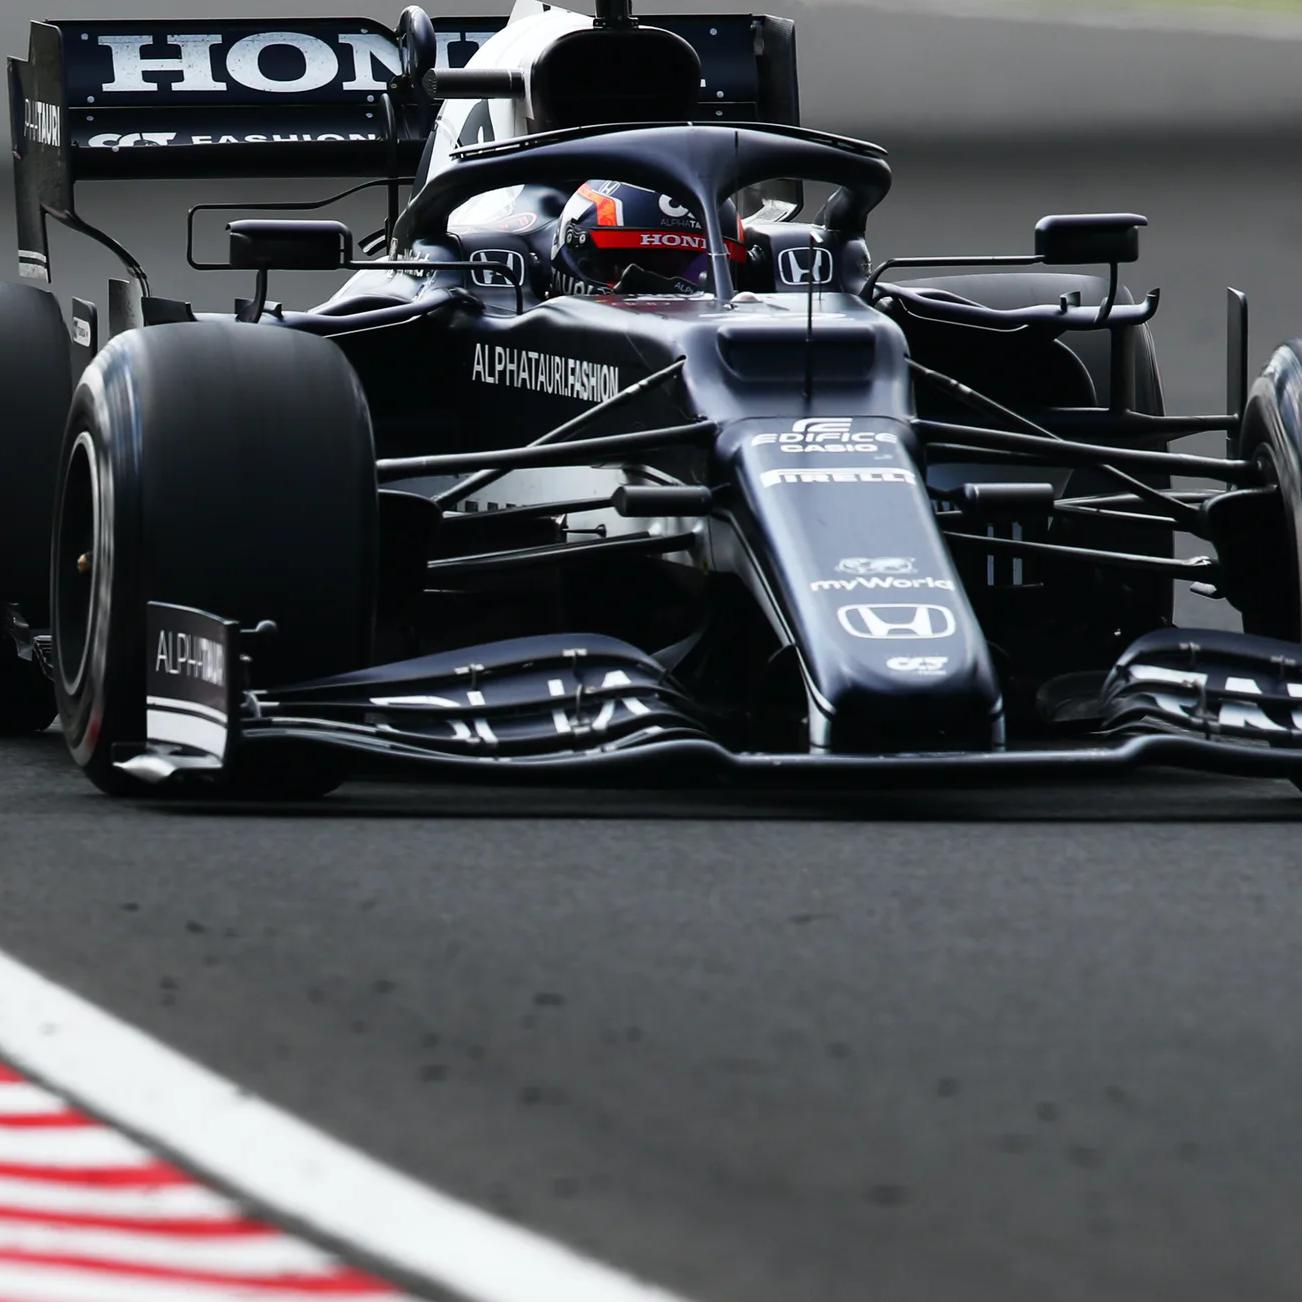 Joe McCormick DriveTribe: F1 2021 Season Review - Hungary Link Thumbnail | Linktree